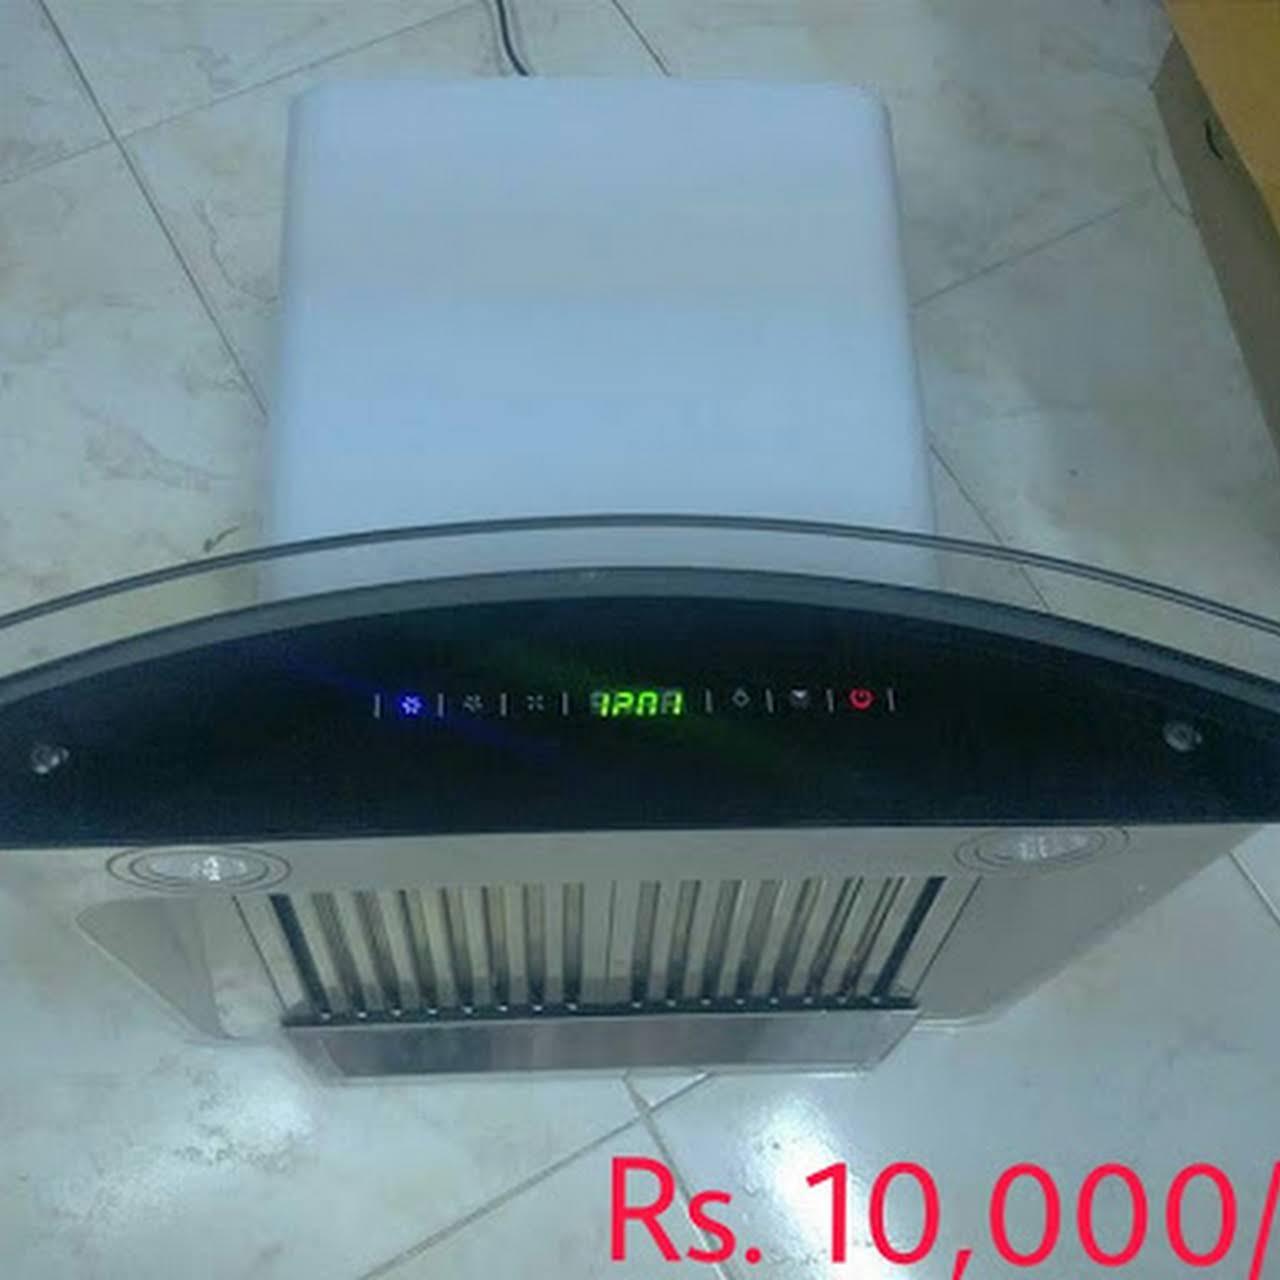 Prakash chimney seles & service - Kitchen Appliances Store in New delhi